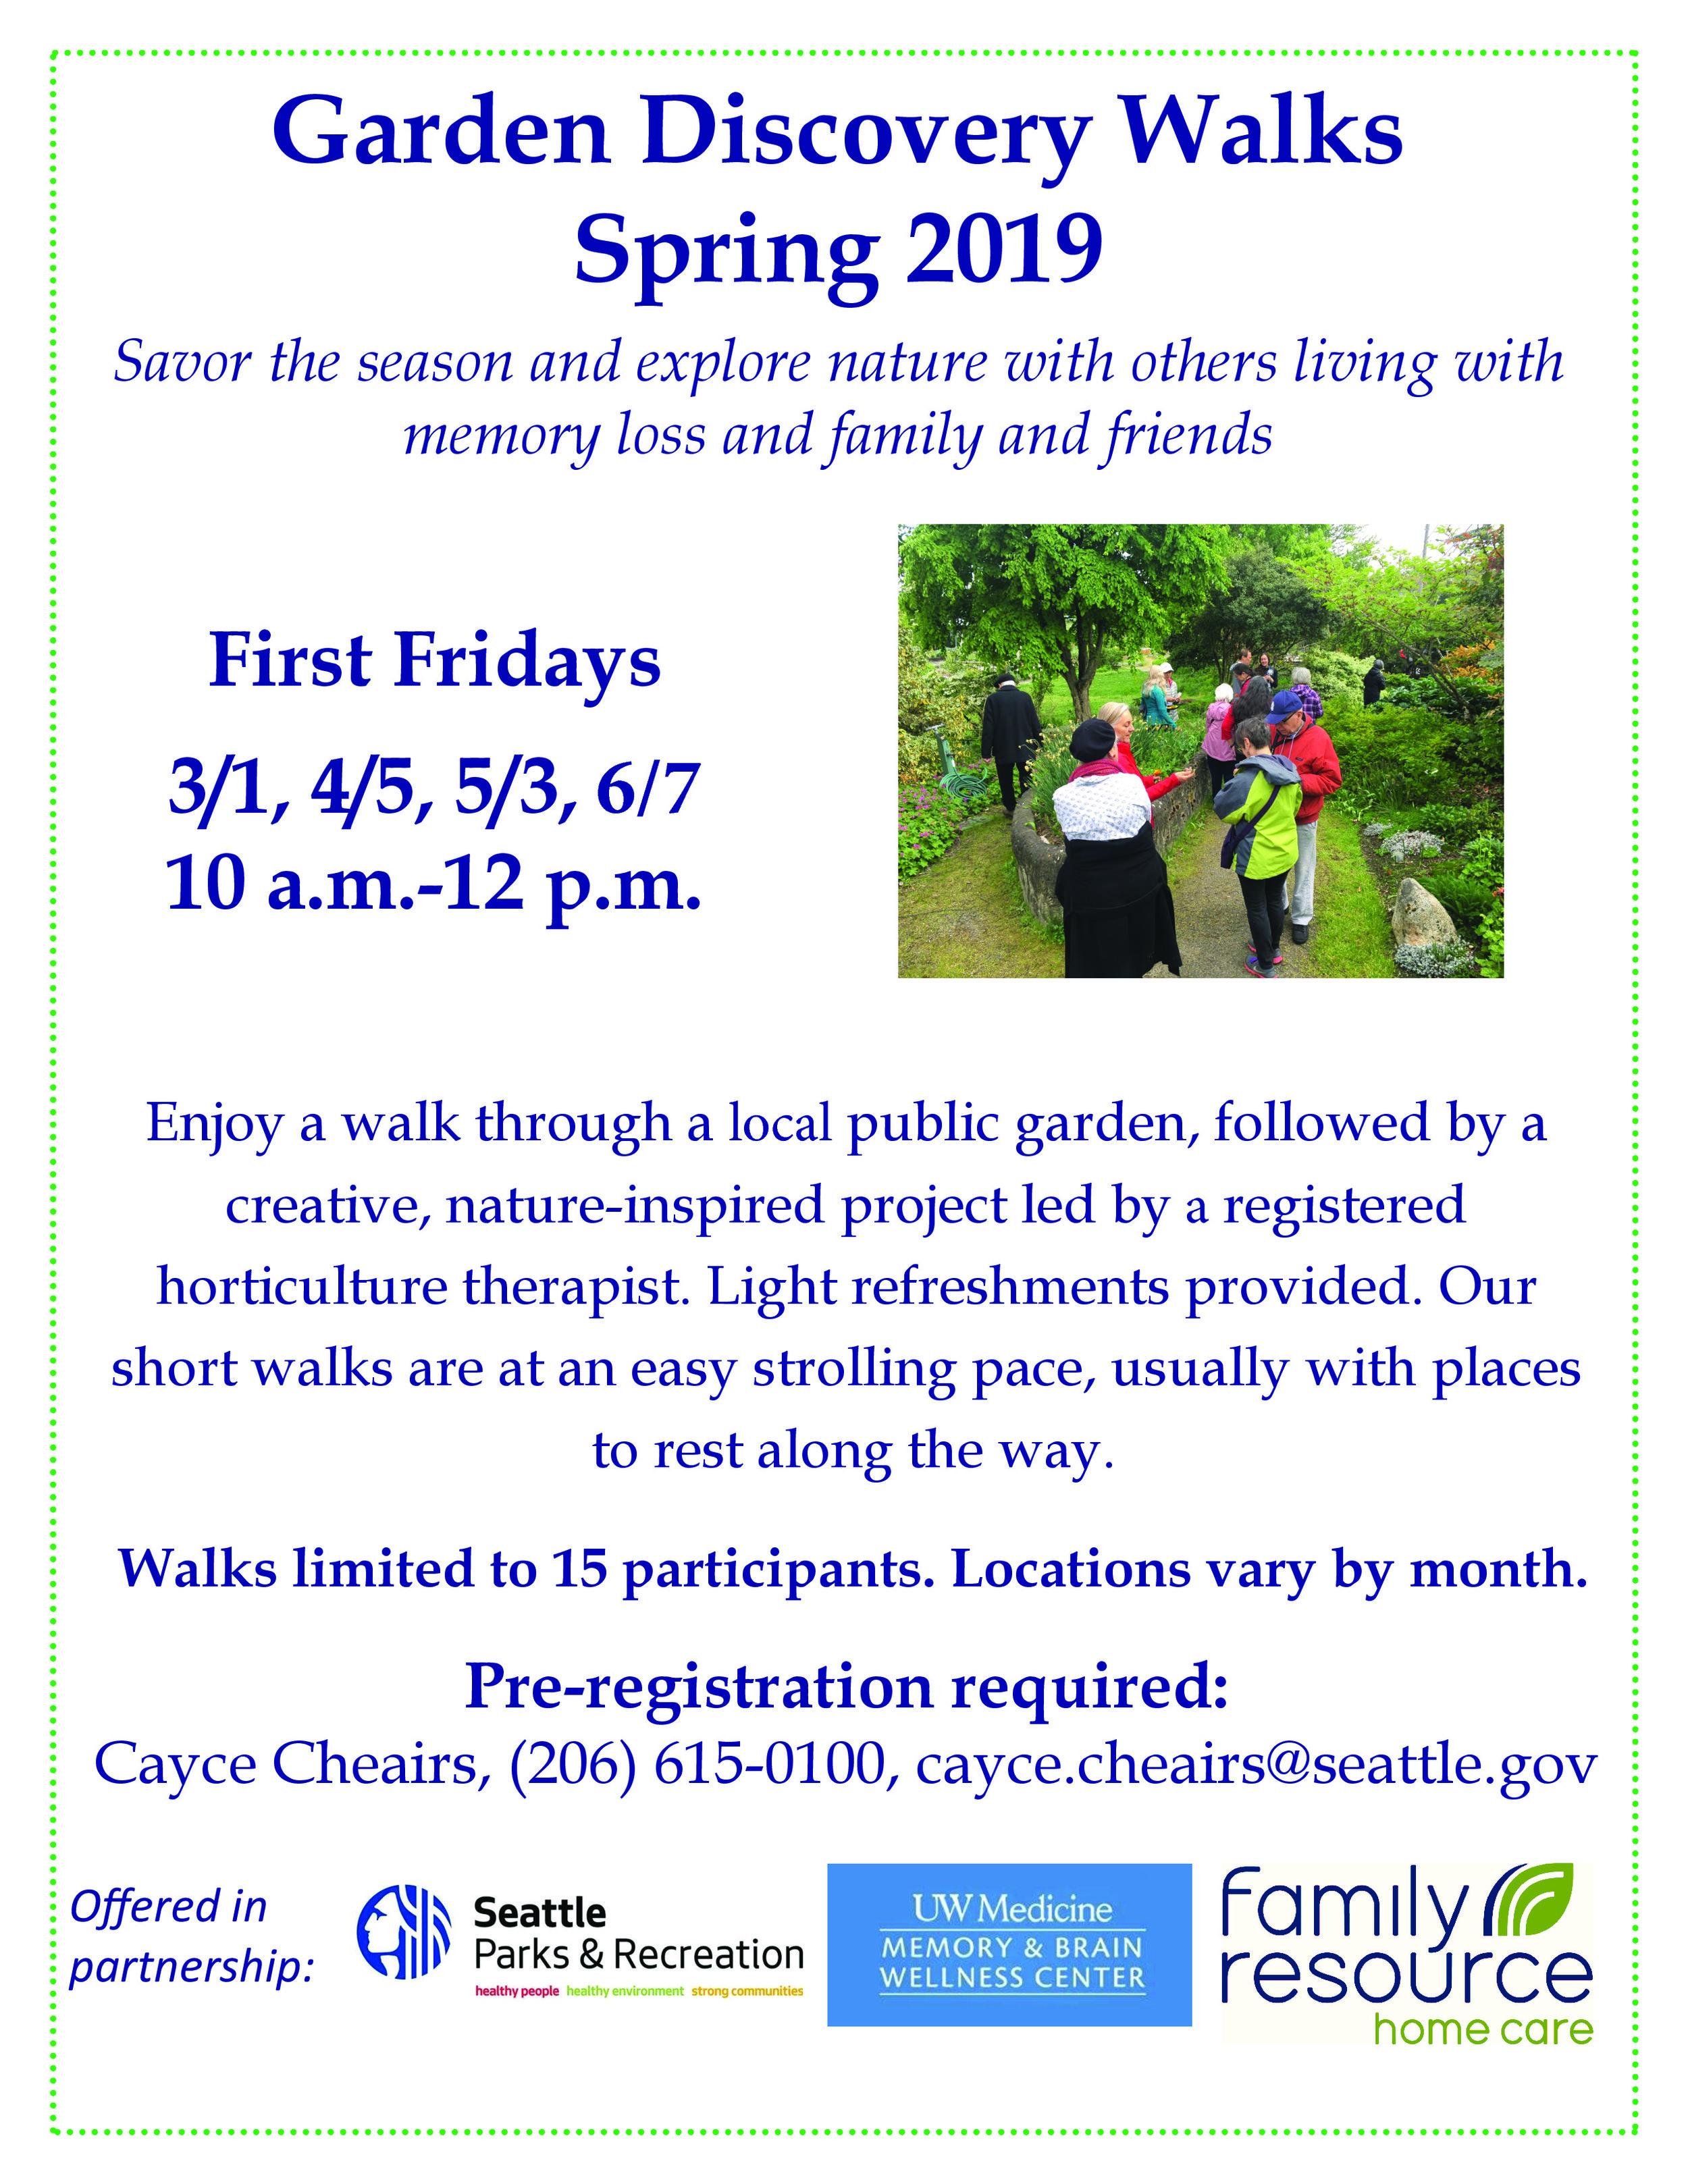 Garden Discovery Walks - Spring2019_Feb8-page-0.jpg